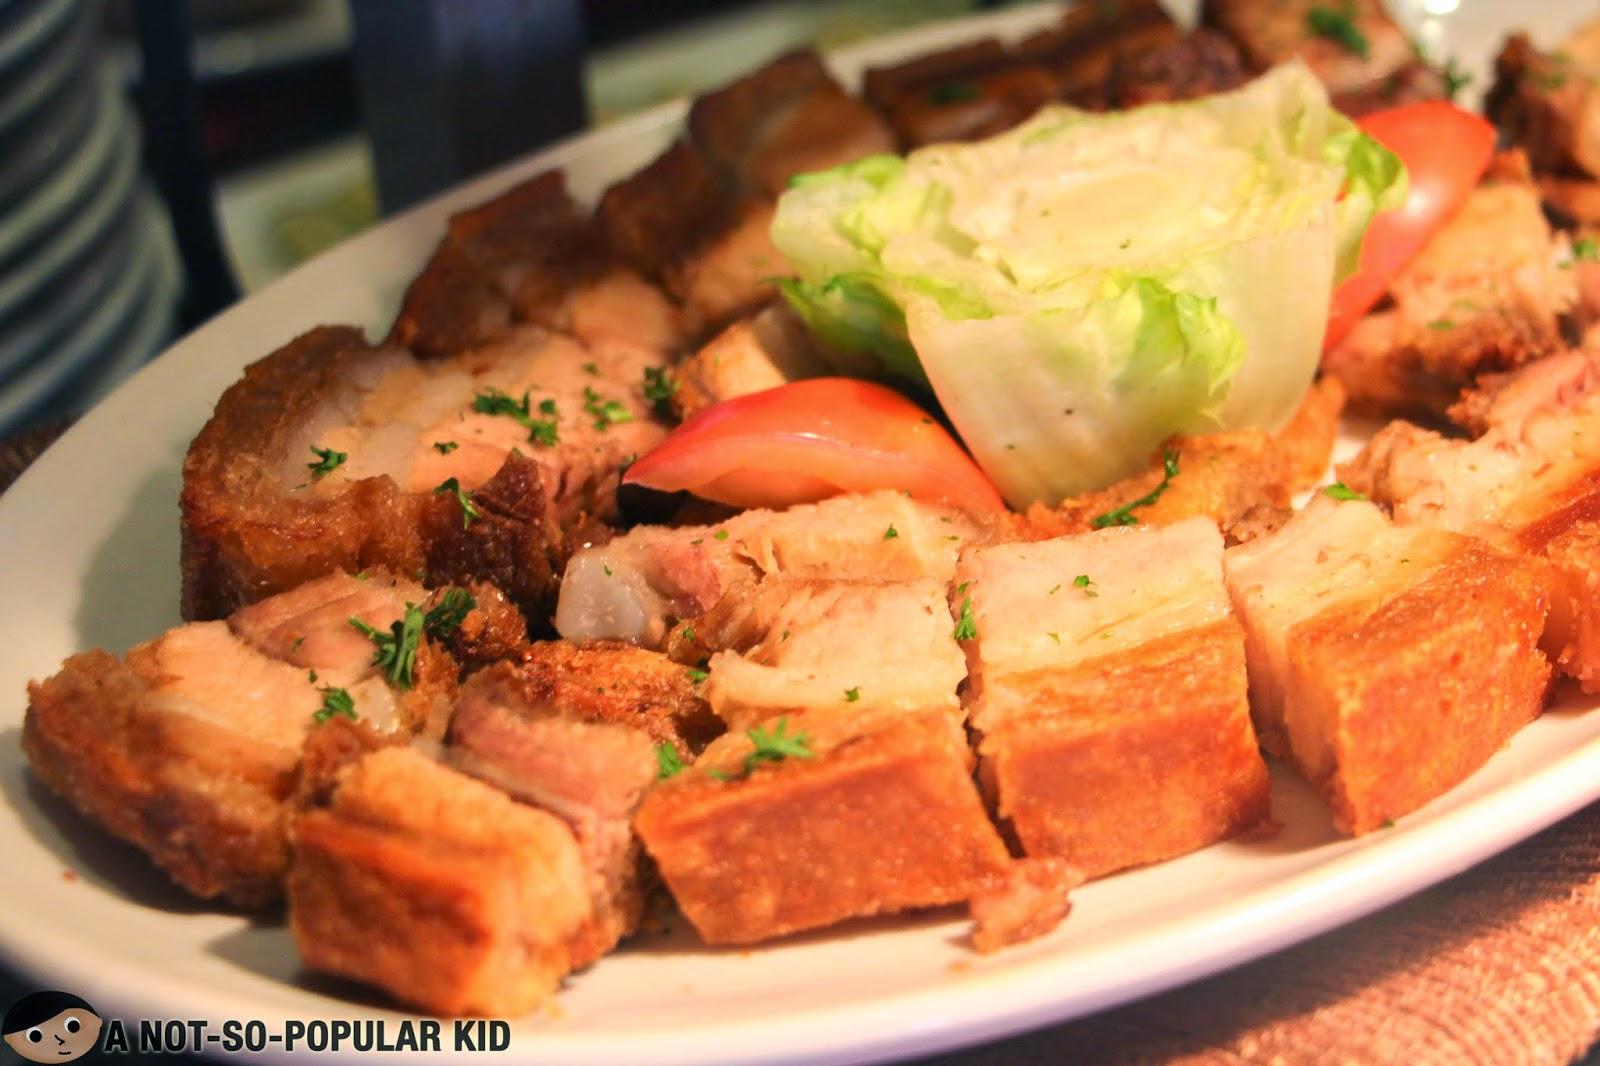 Filipino Cuisine - Lechong Kawali